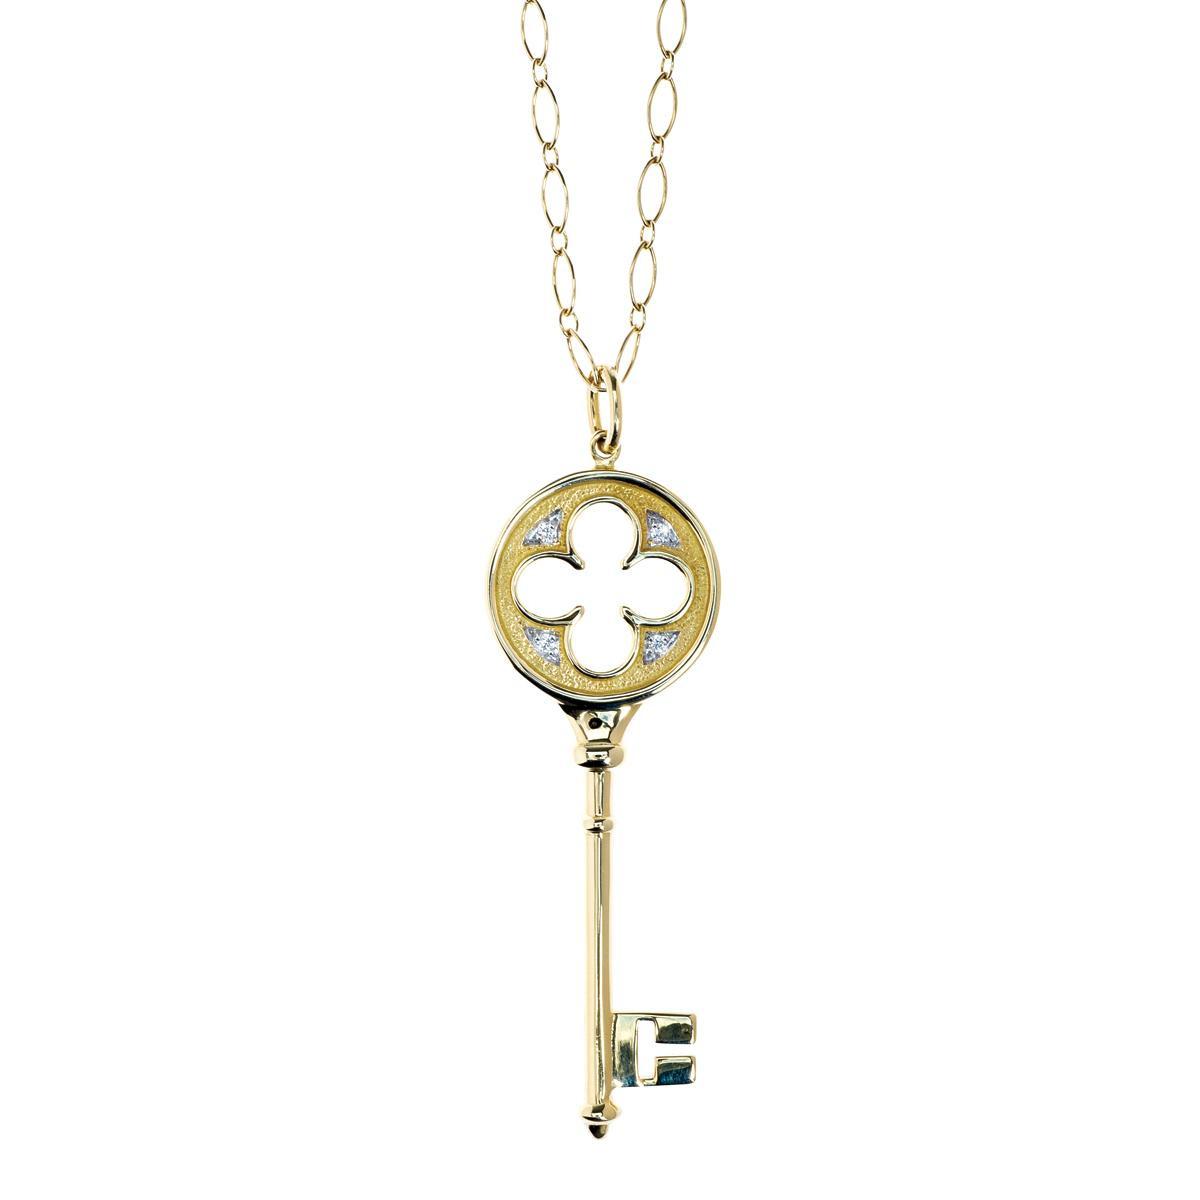 Tiffany And Co Necklace Key